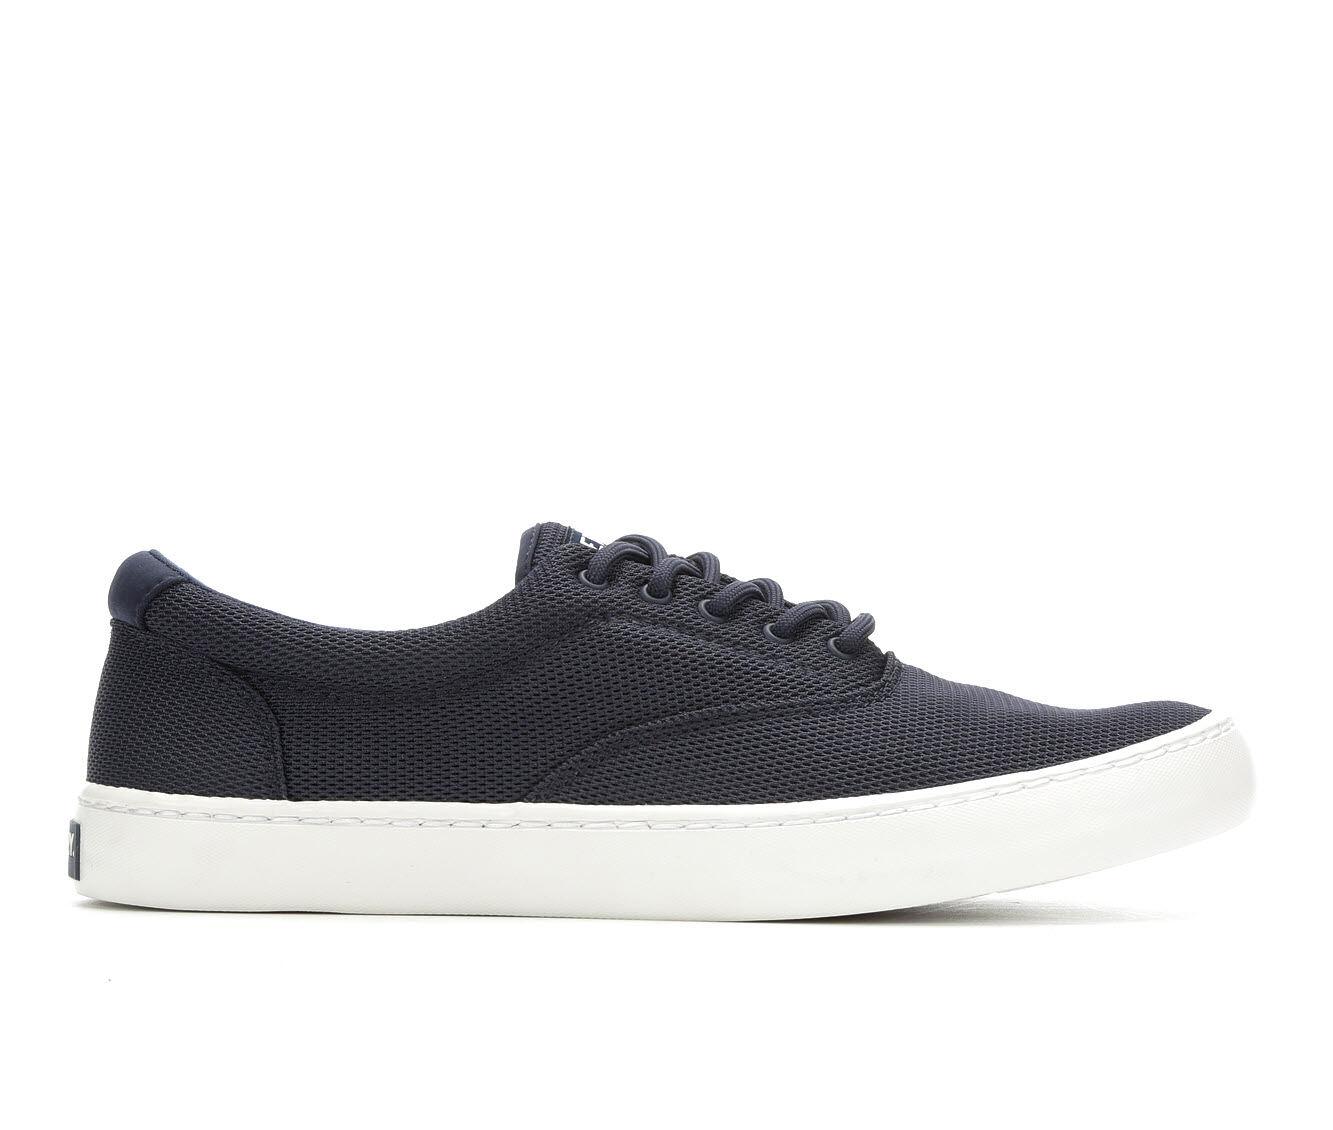 Men's Sperry Cutter CVO Mesh Casual Shoes Navy Mesh